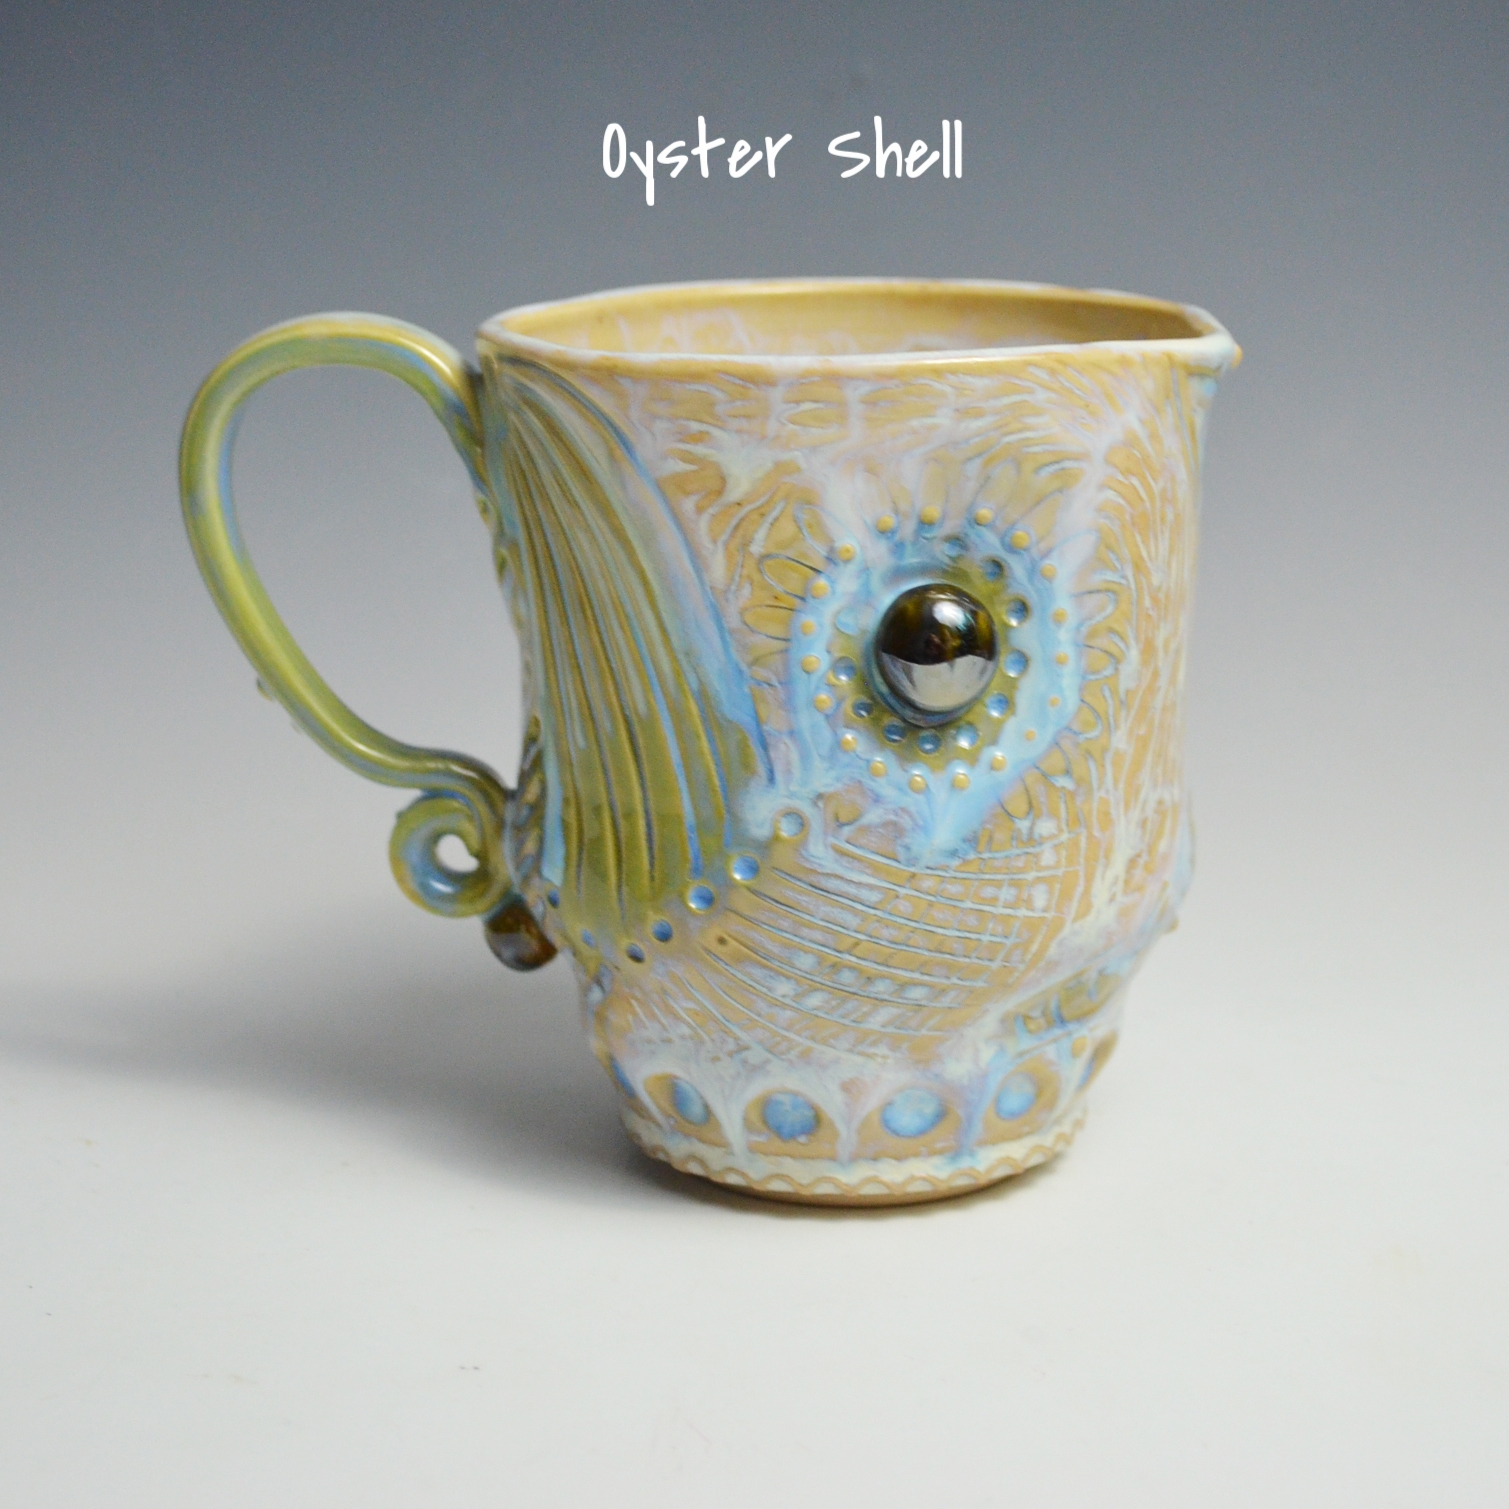 2595 - Oyster Shell.JPG